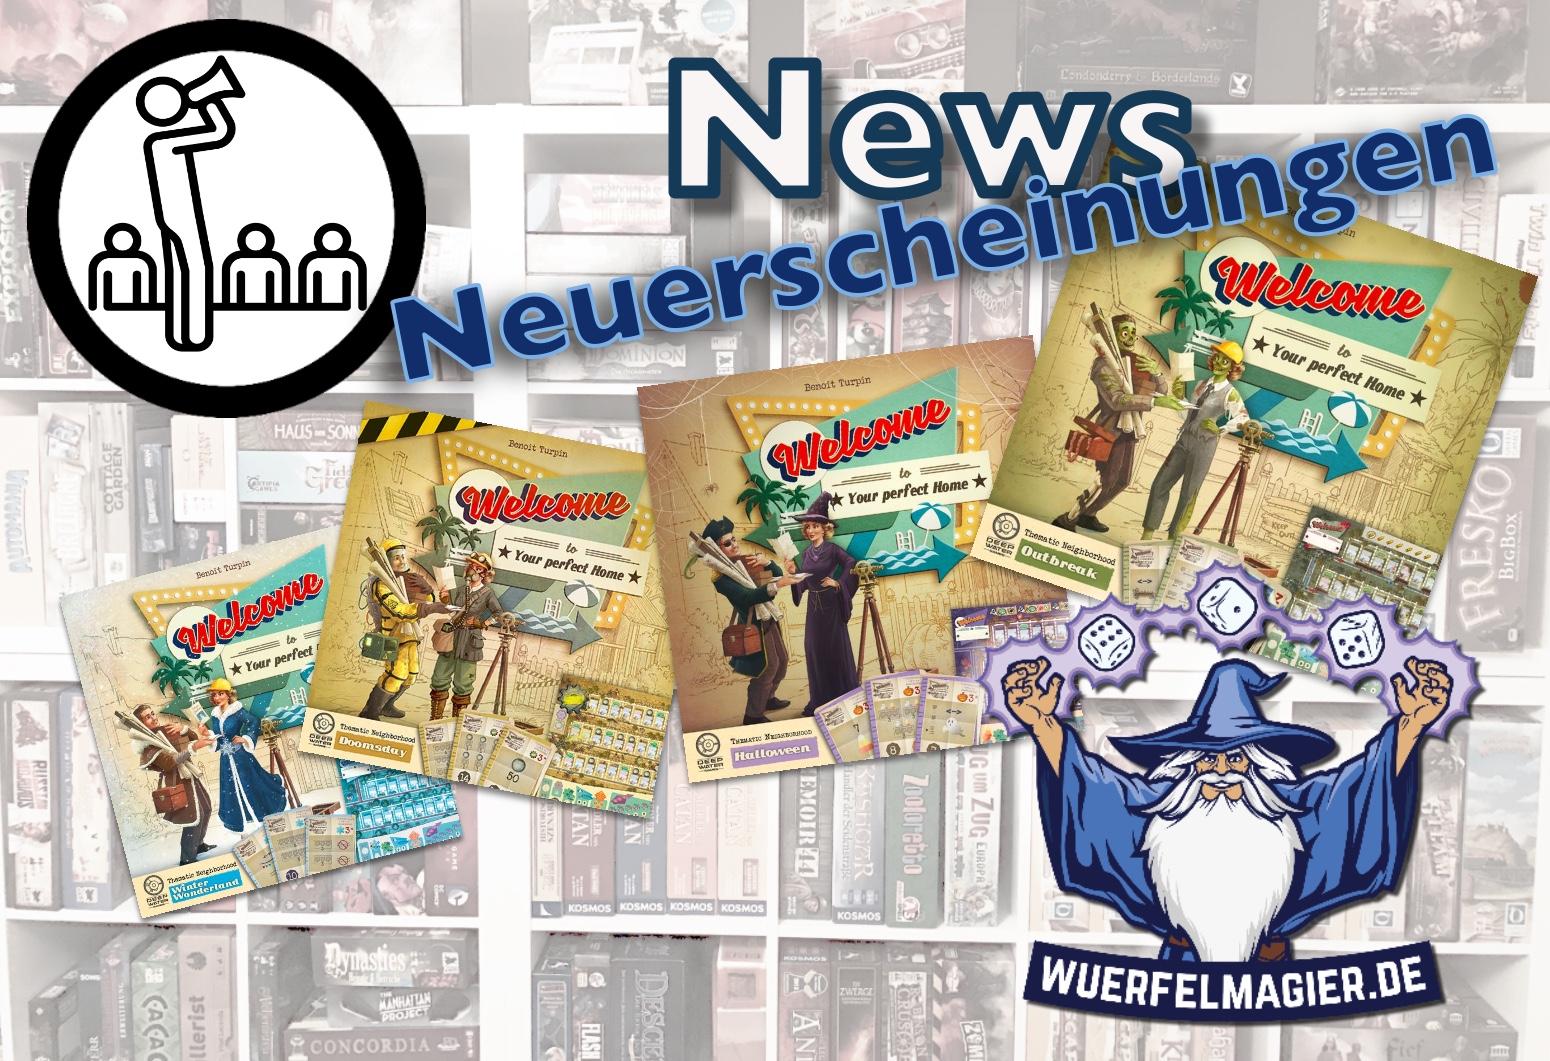 News Neuerscheinung Welcome To Wuerfelmagier Würfelmagier